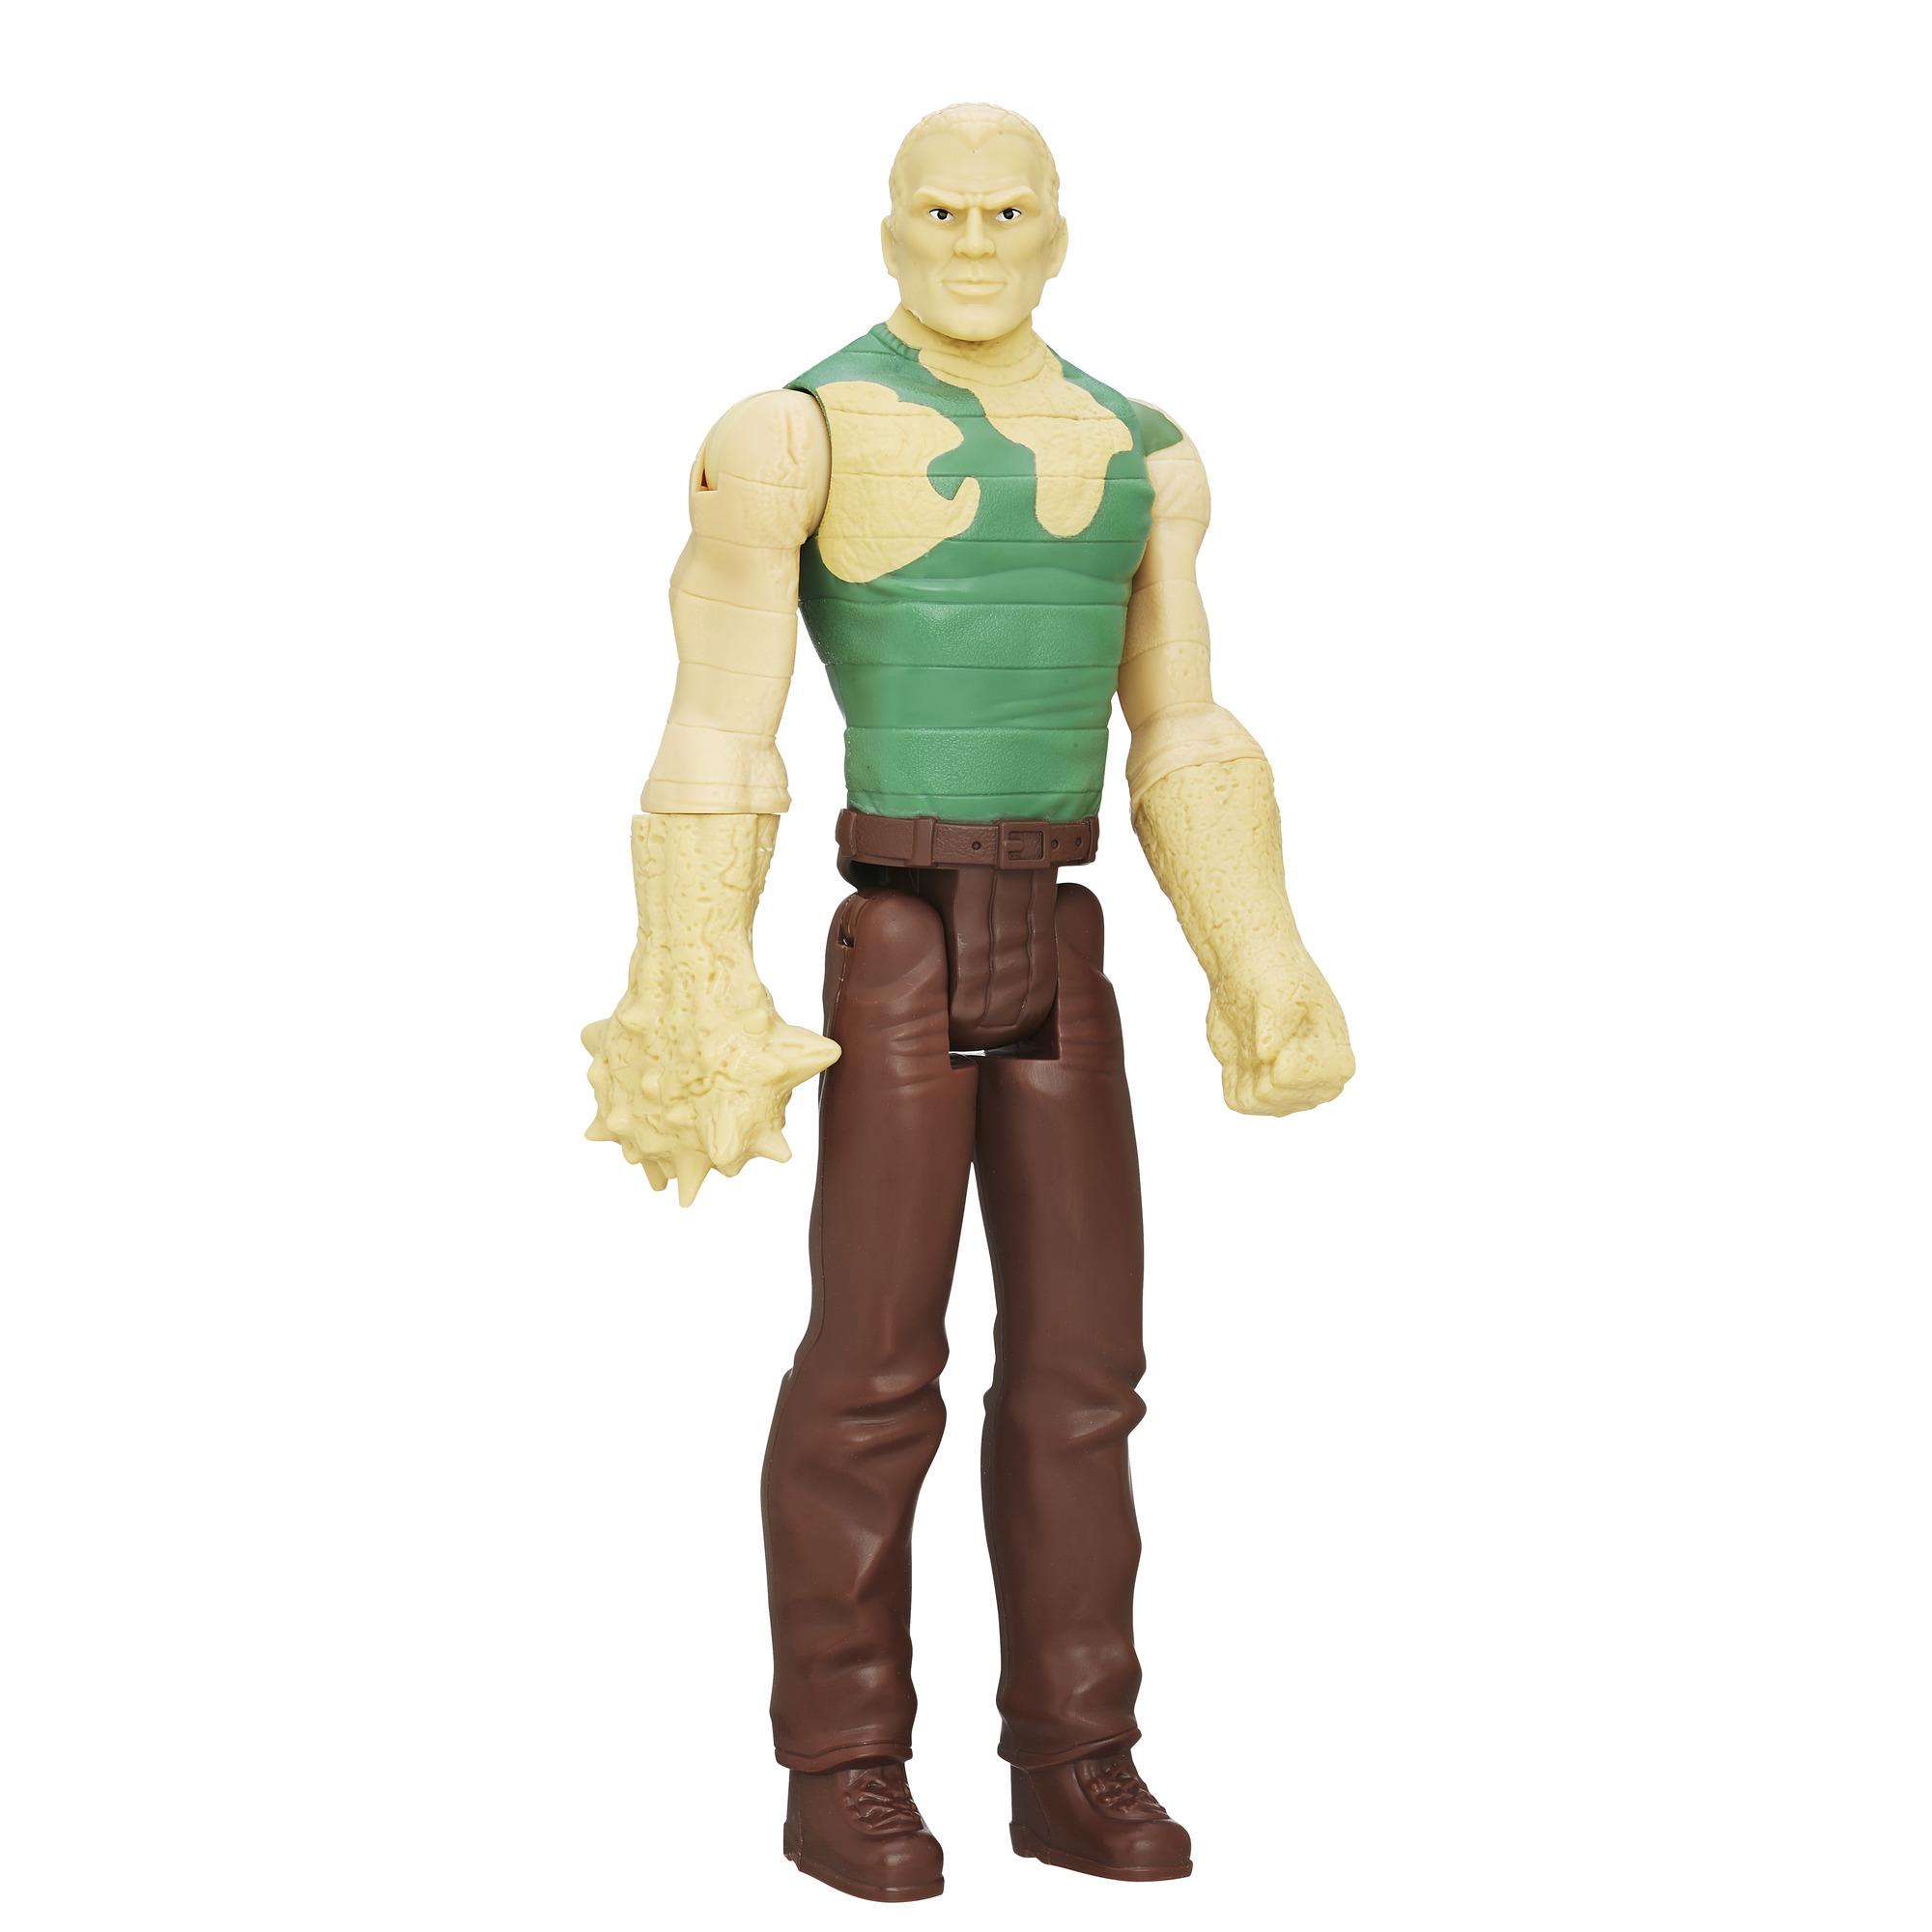 Фигурка героя из серии Ultimate Spider-Man Sinister 6  Песочный человек - Герои MARVEL, артикул: 154622